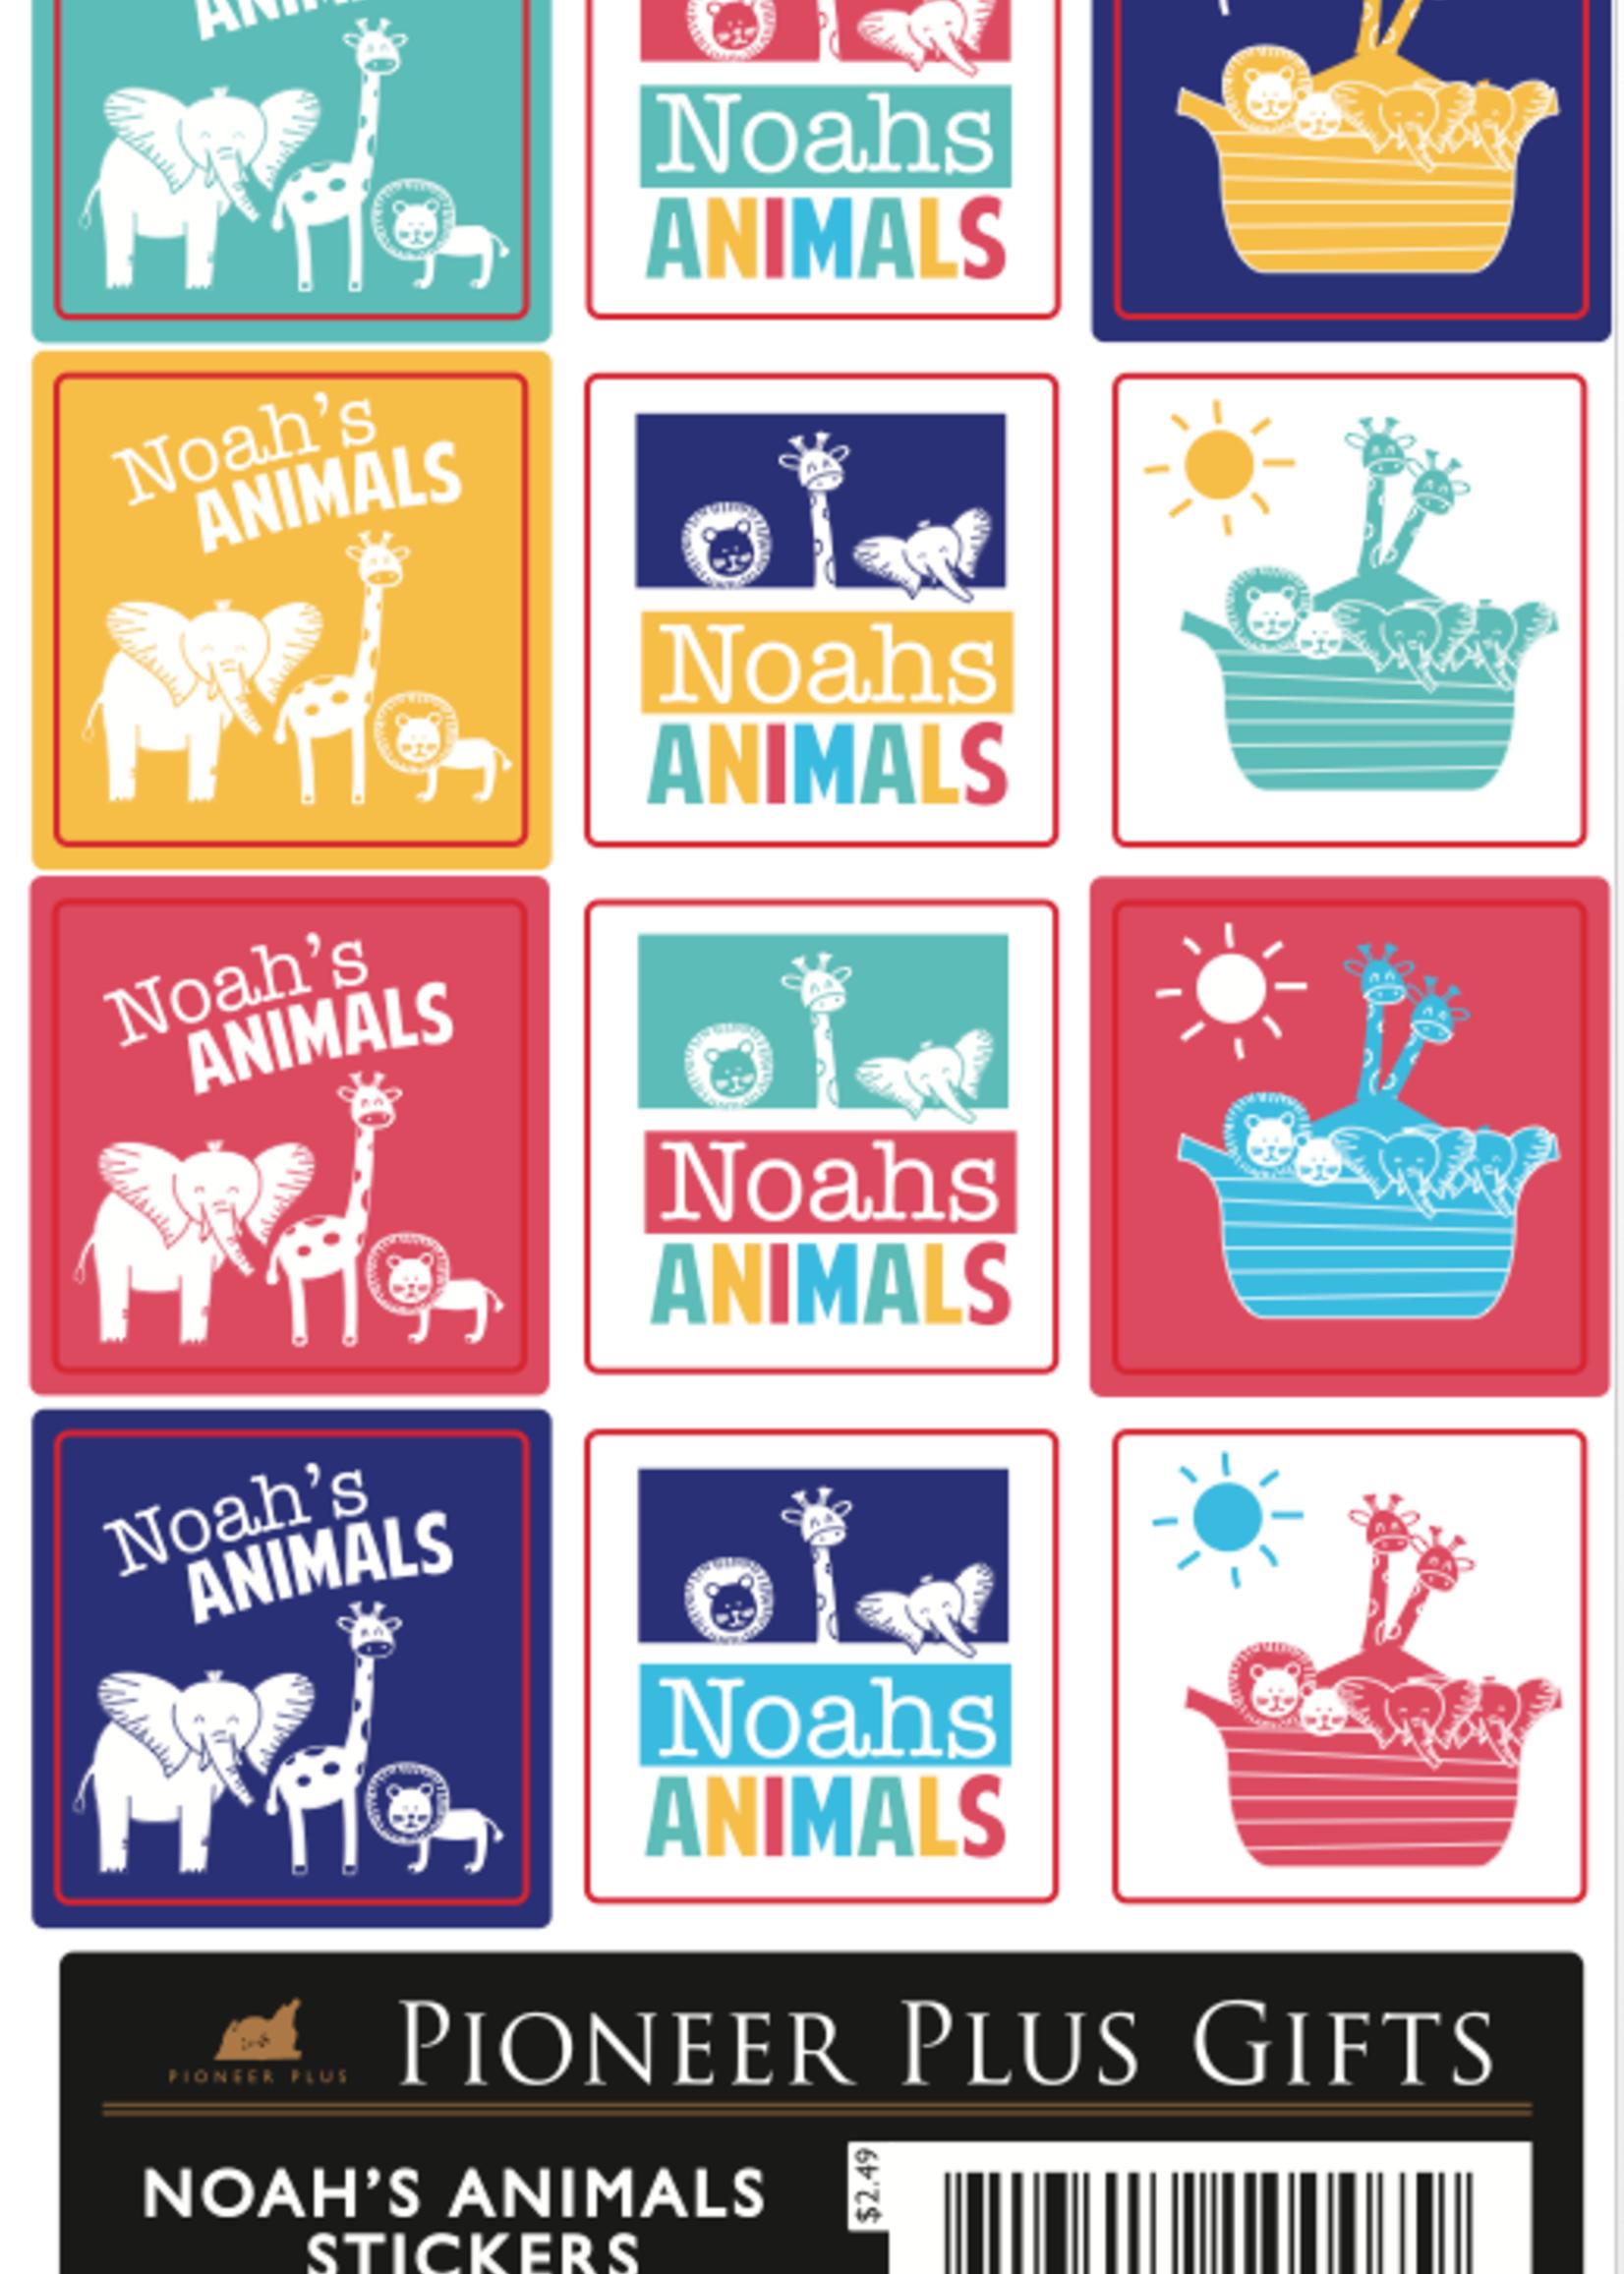 Noah's Animal Stickers